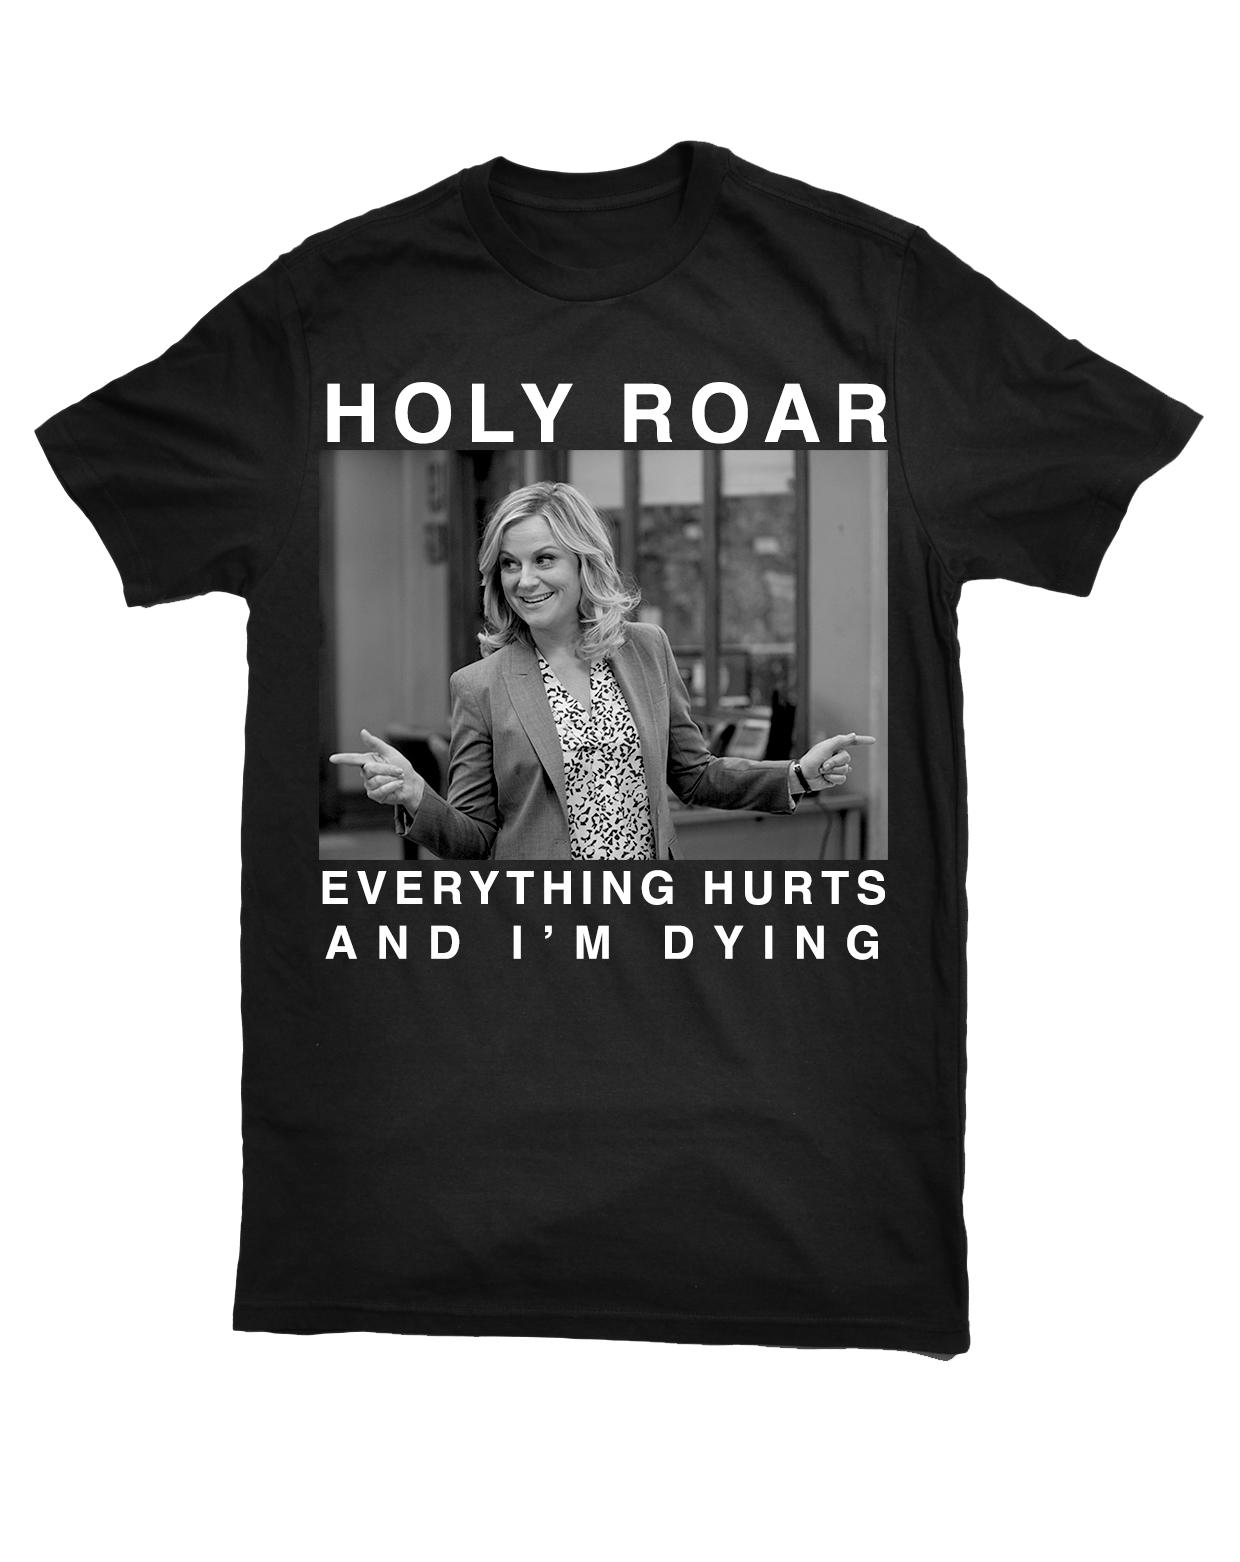 Holy Roar x Leslie Knope